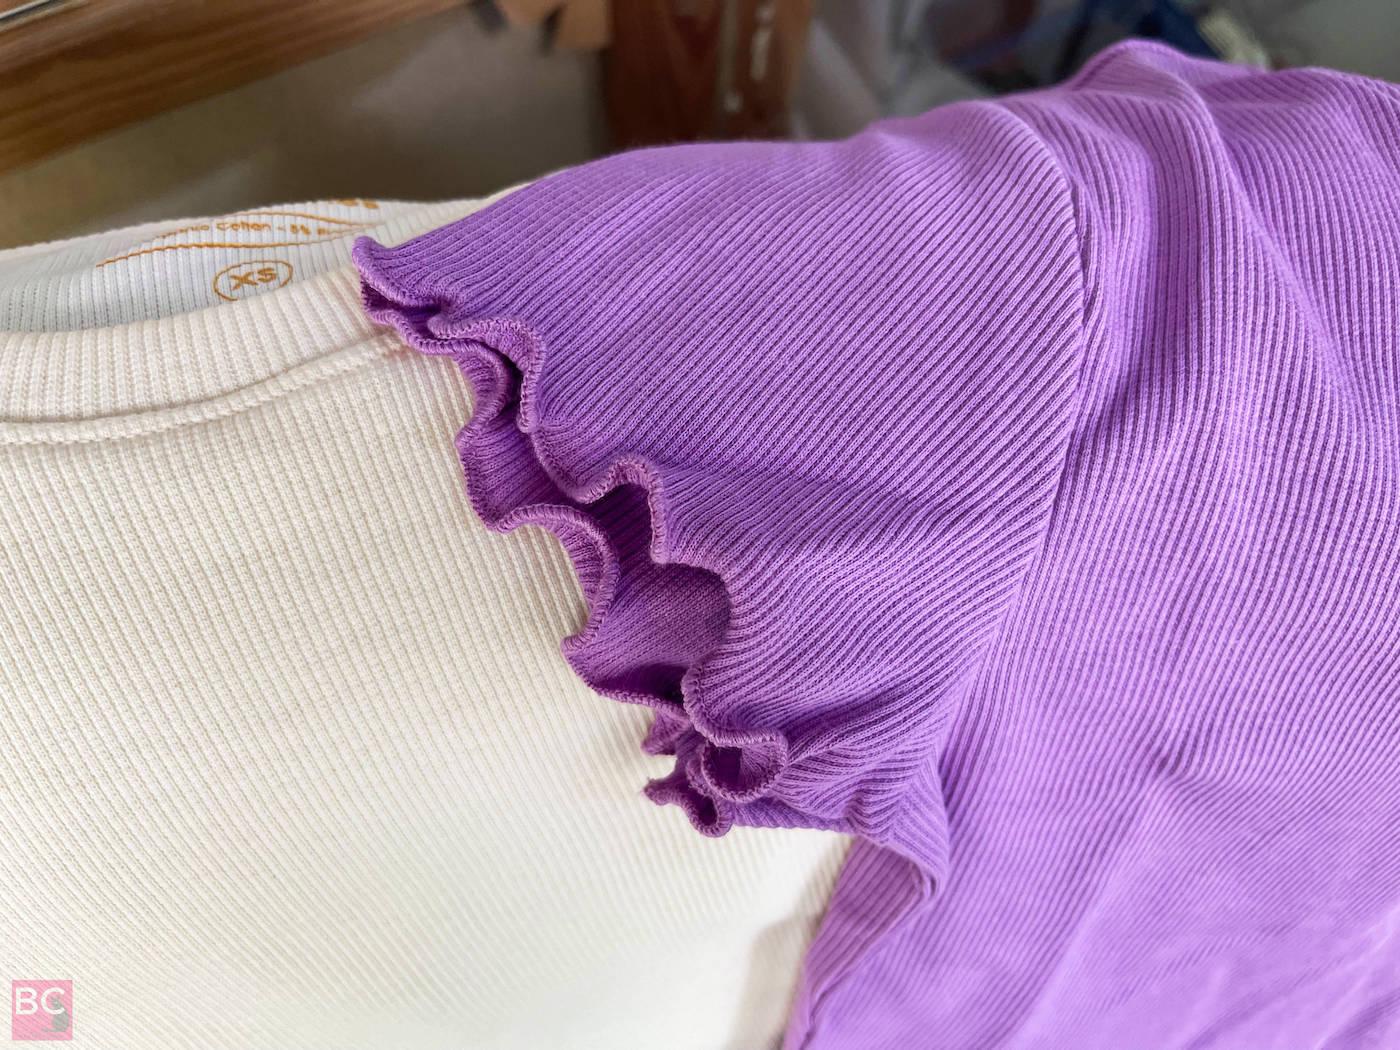 Ärmel Wellenbund The April Top Shirt Les Lunes Erfahrungen Farbe Lilac Oatmilk